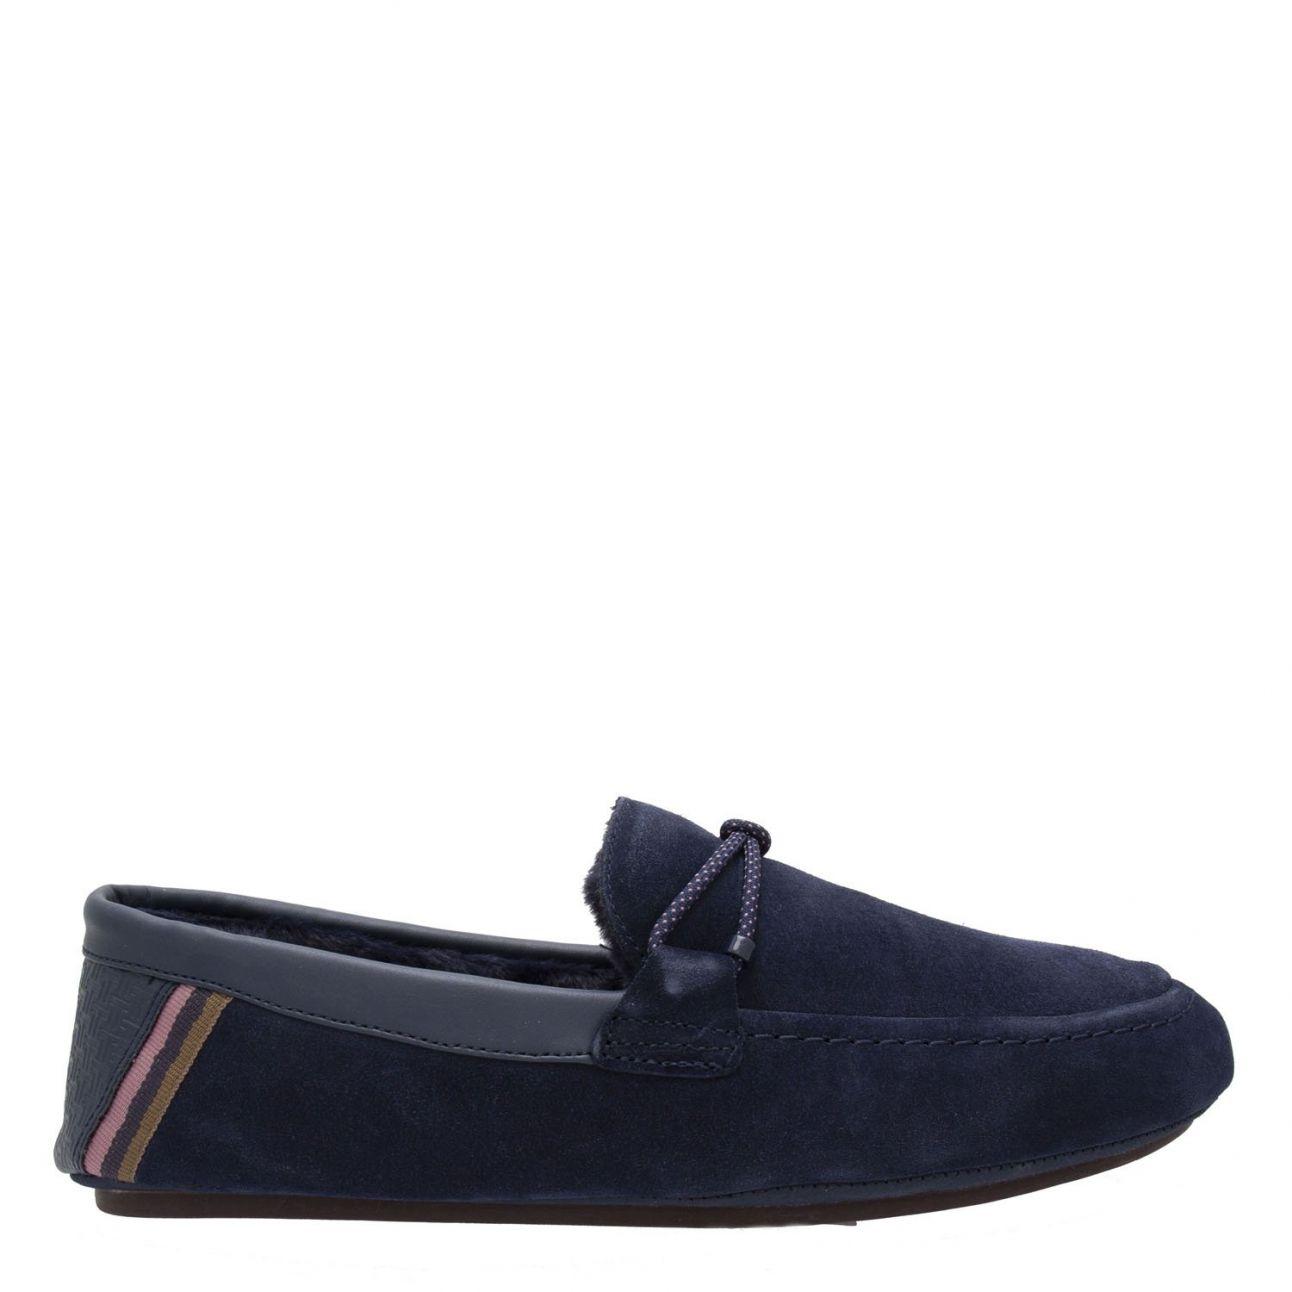 Ted Baker Seffel Mens Dark Brown Suede Slippers Shoes